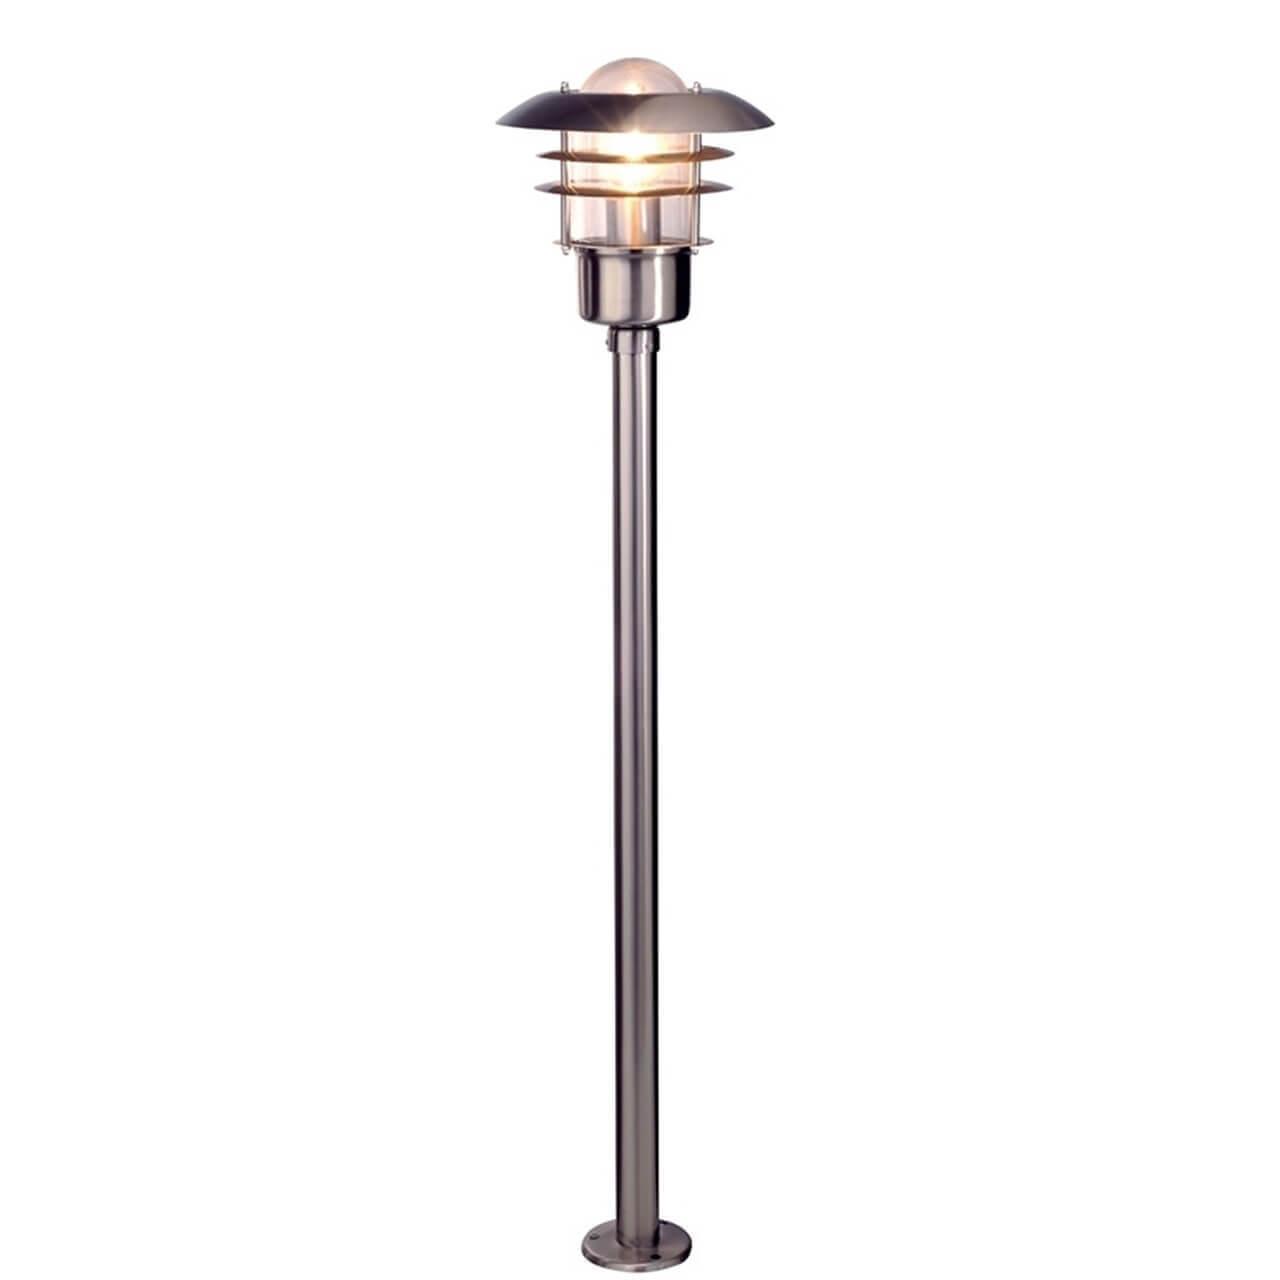 Уличный столб Deko-Light Gorro 730035